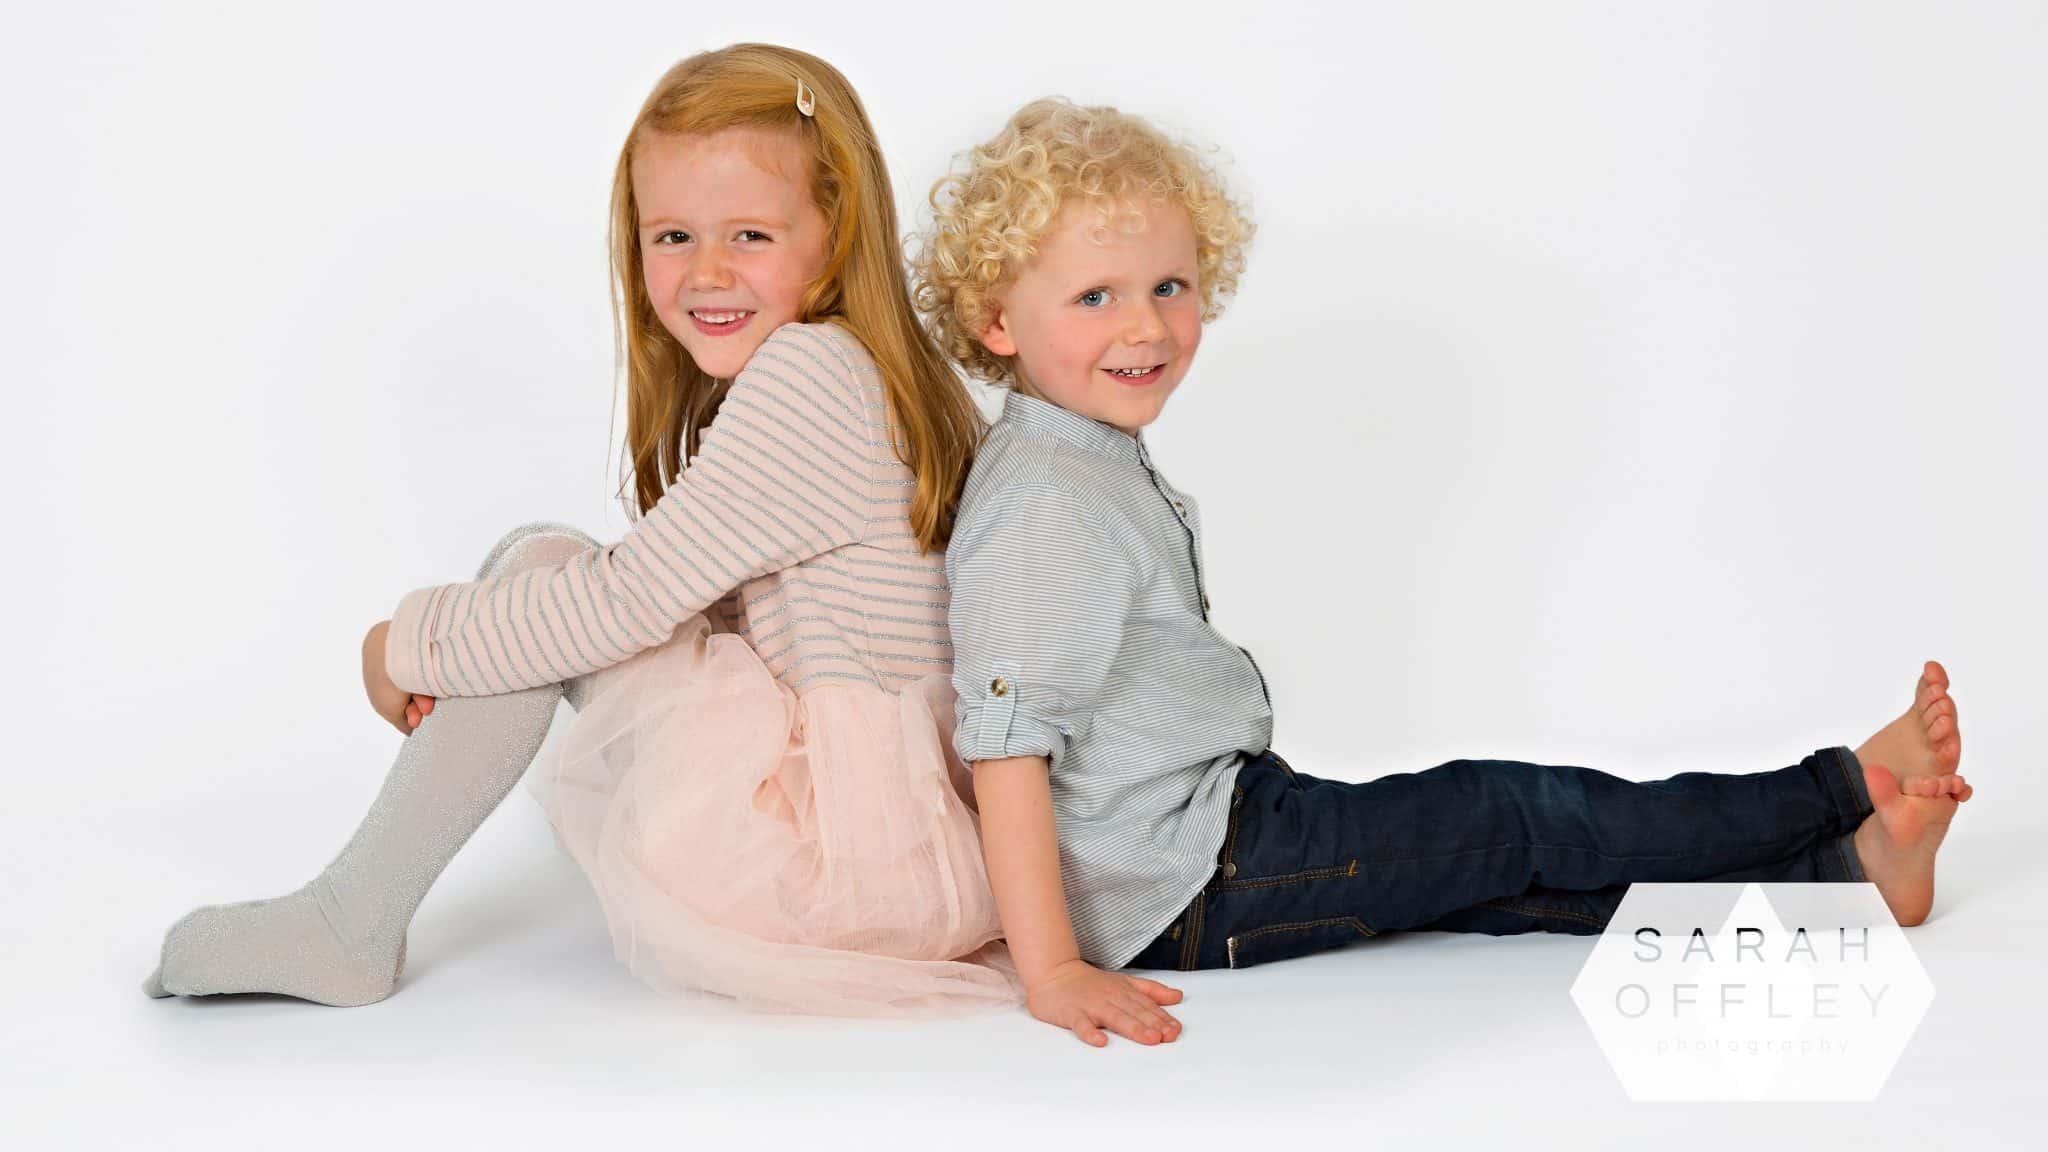 child photography sarah offley